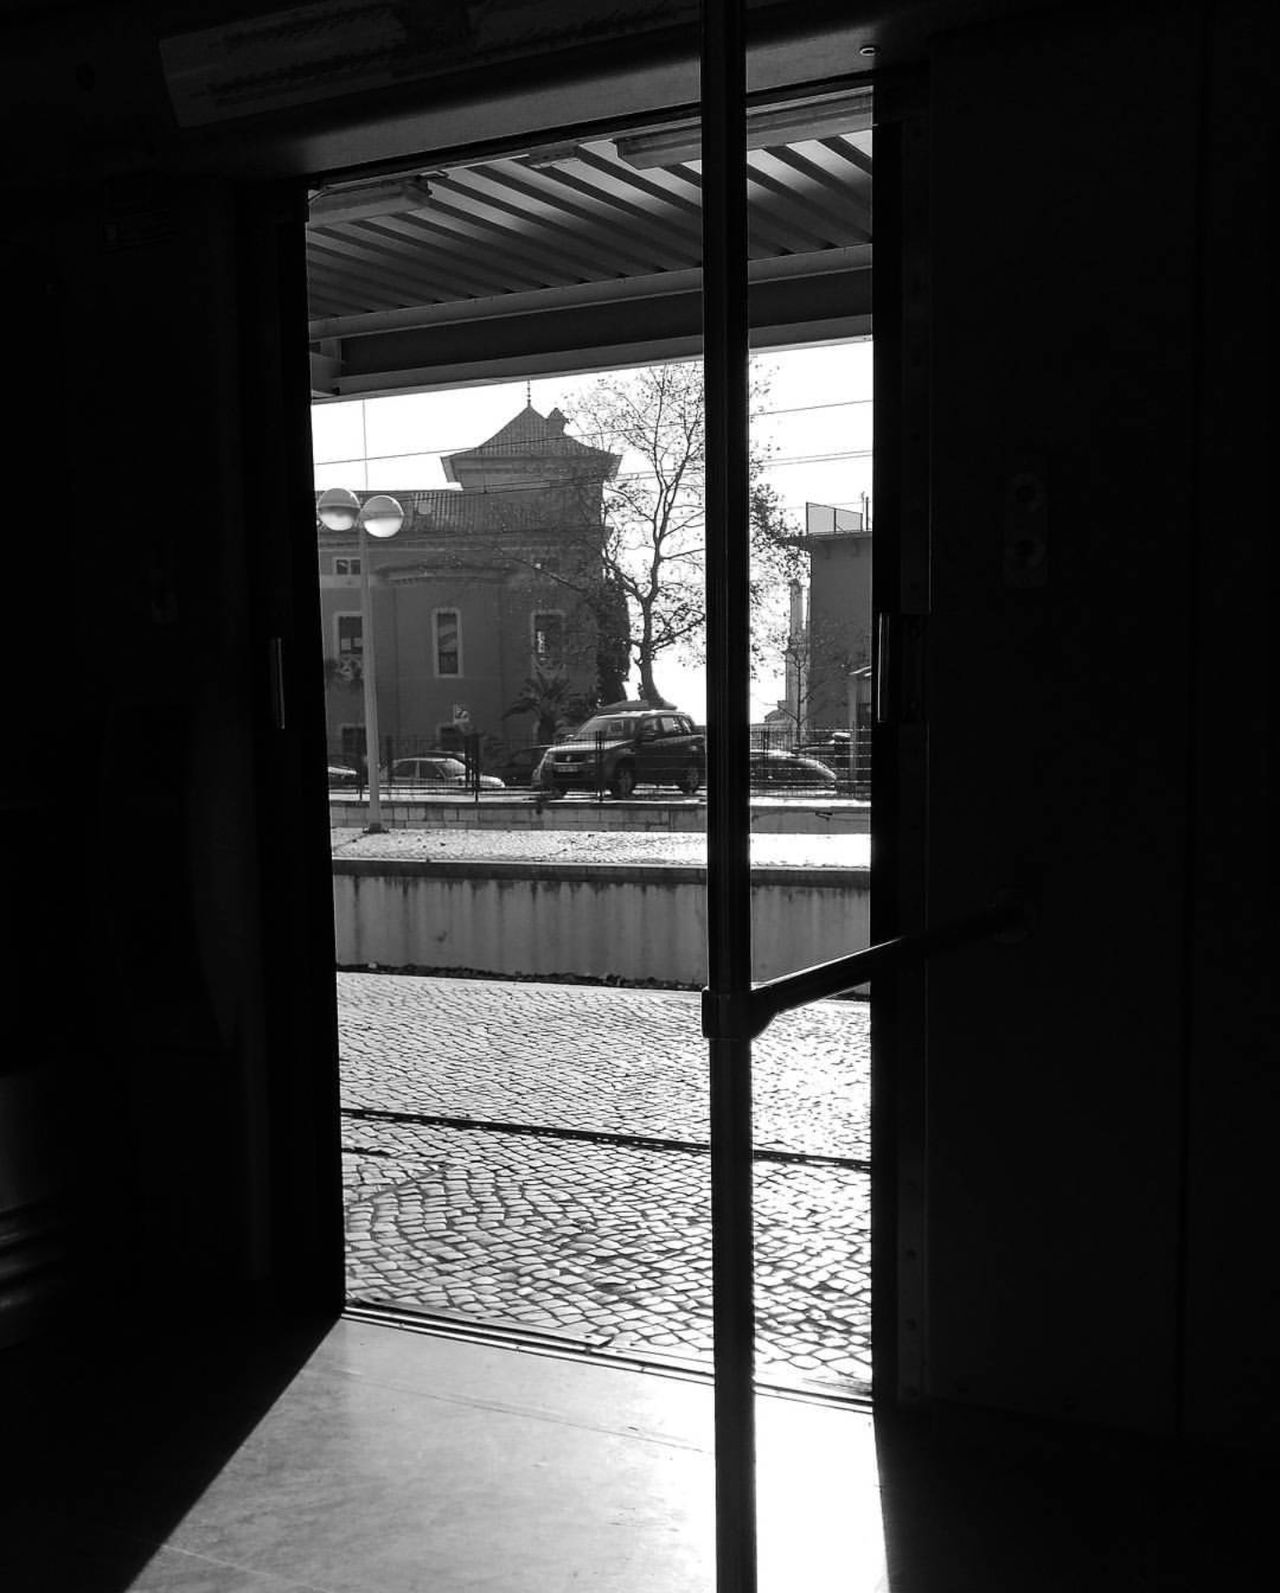 Sliding Door City Looking Through Window Architecture